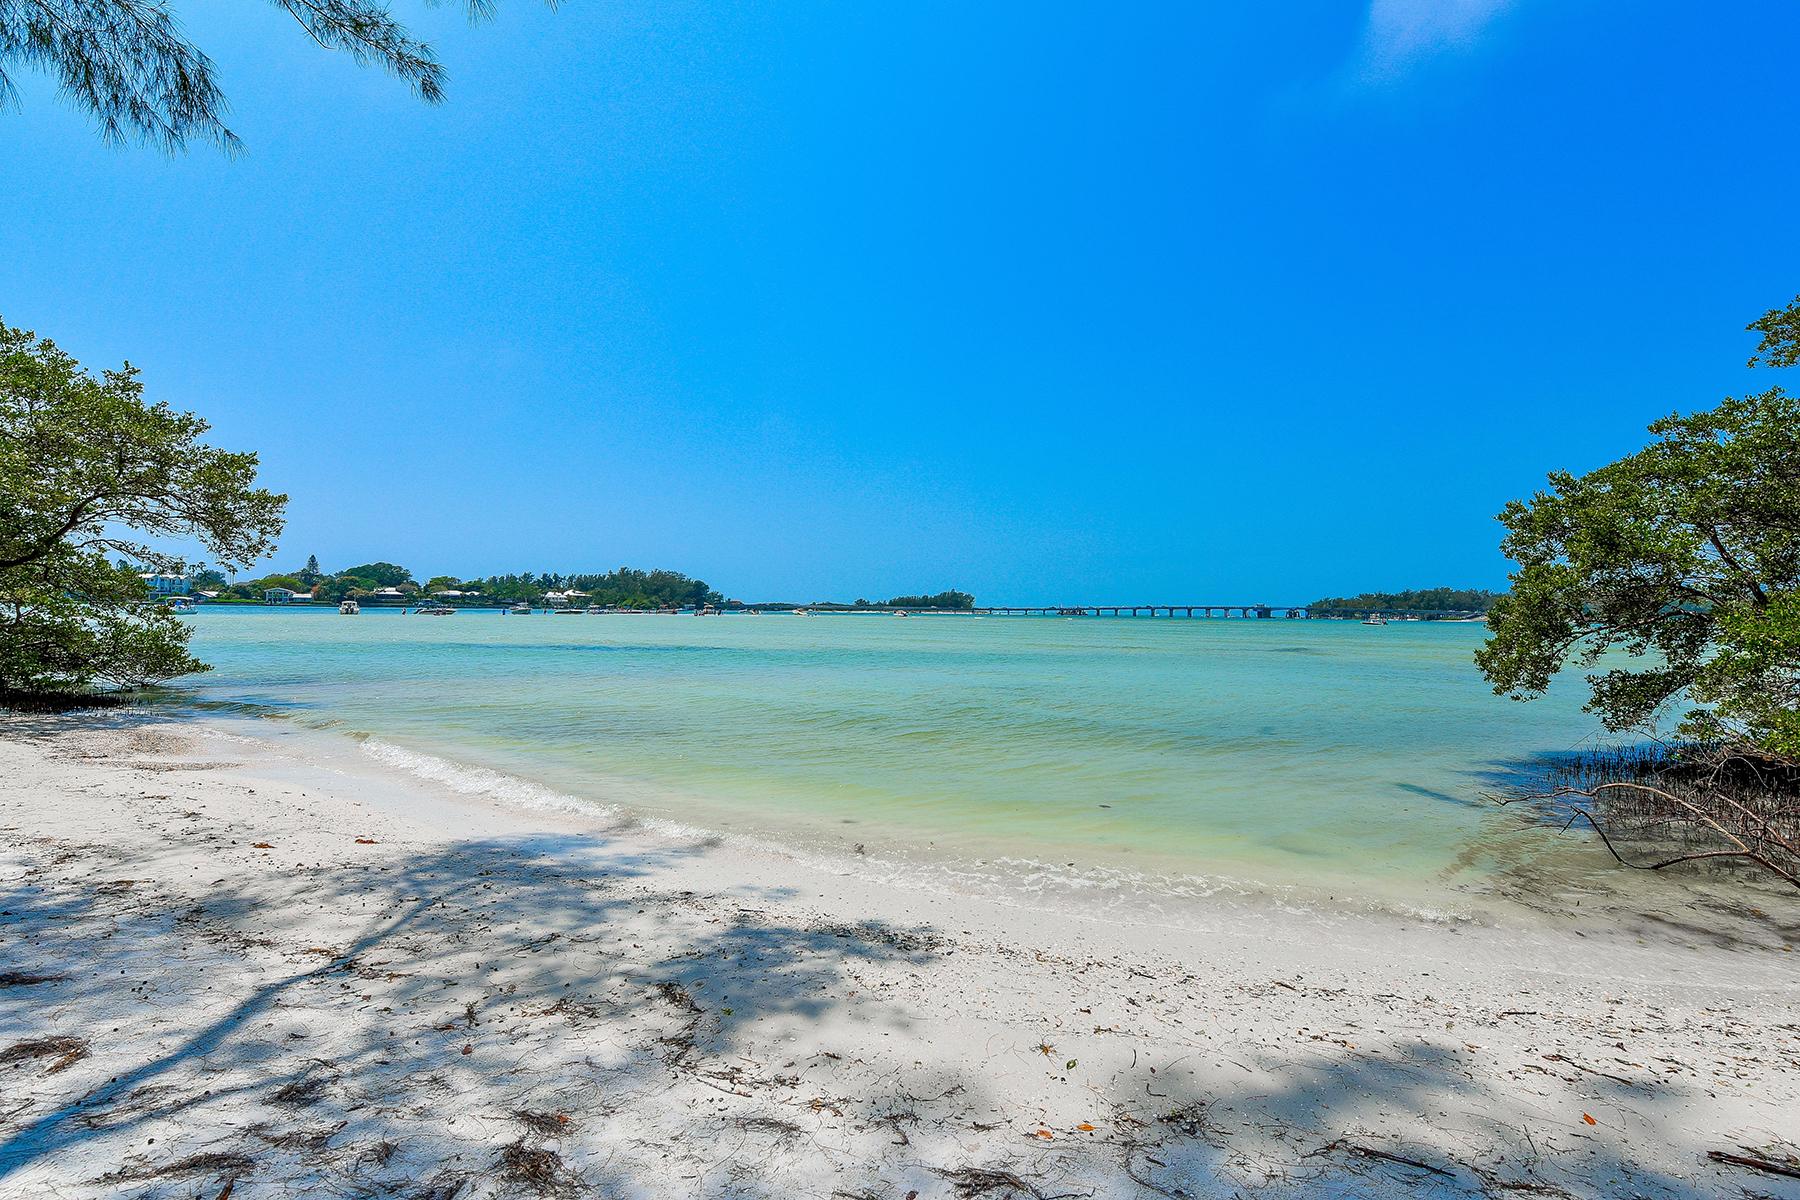 Land for Sale at LA LENAIRE ISLE 7149 La Lenaire Dr 8 / 9 Longboat Key, Florida, 34228 United States